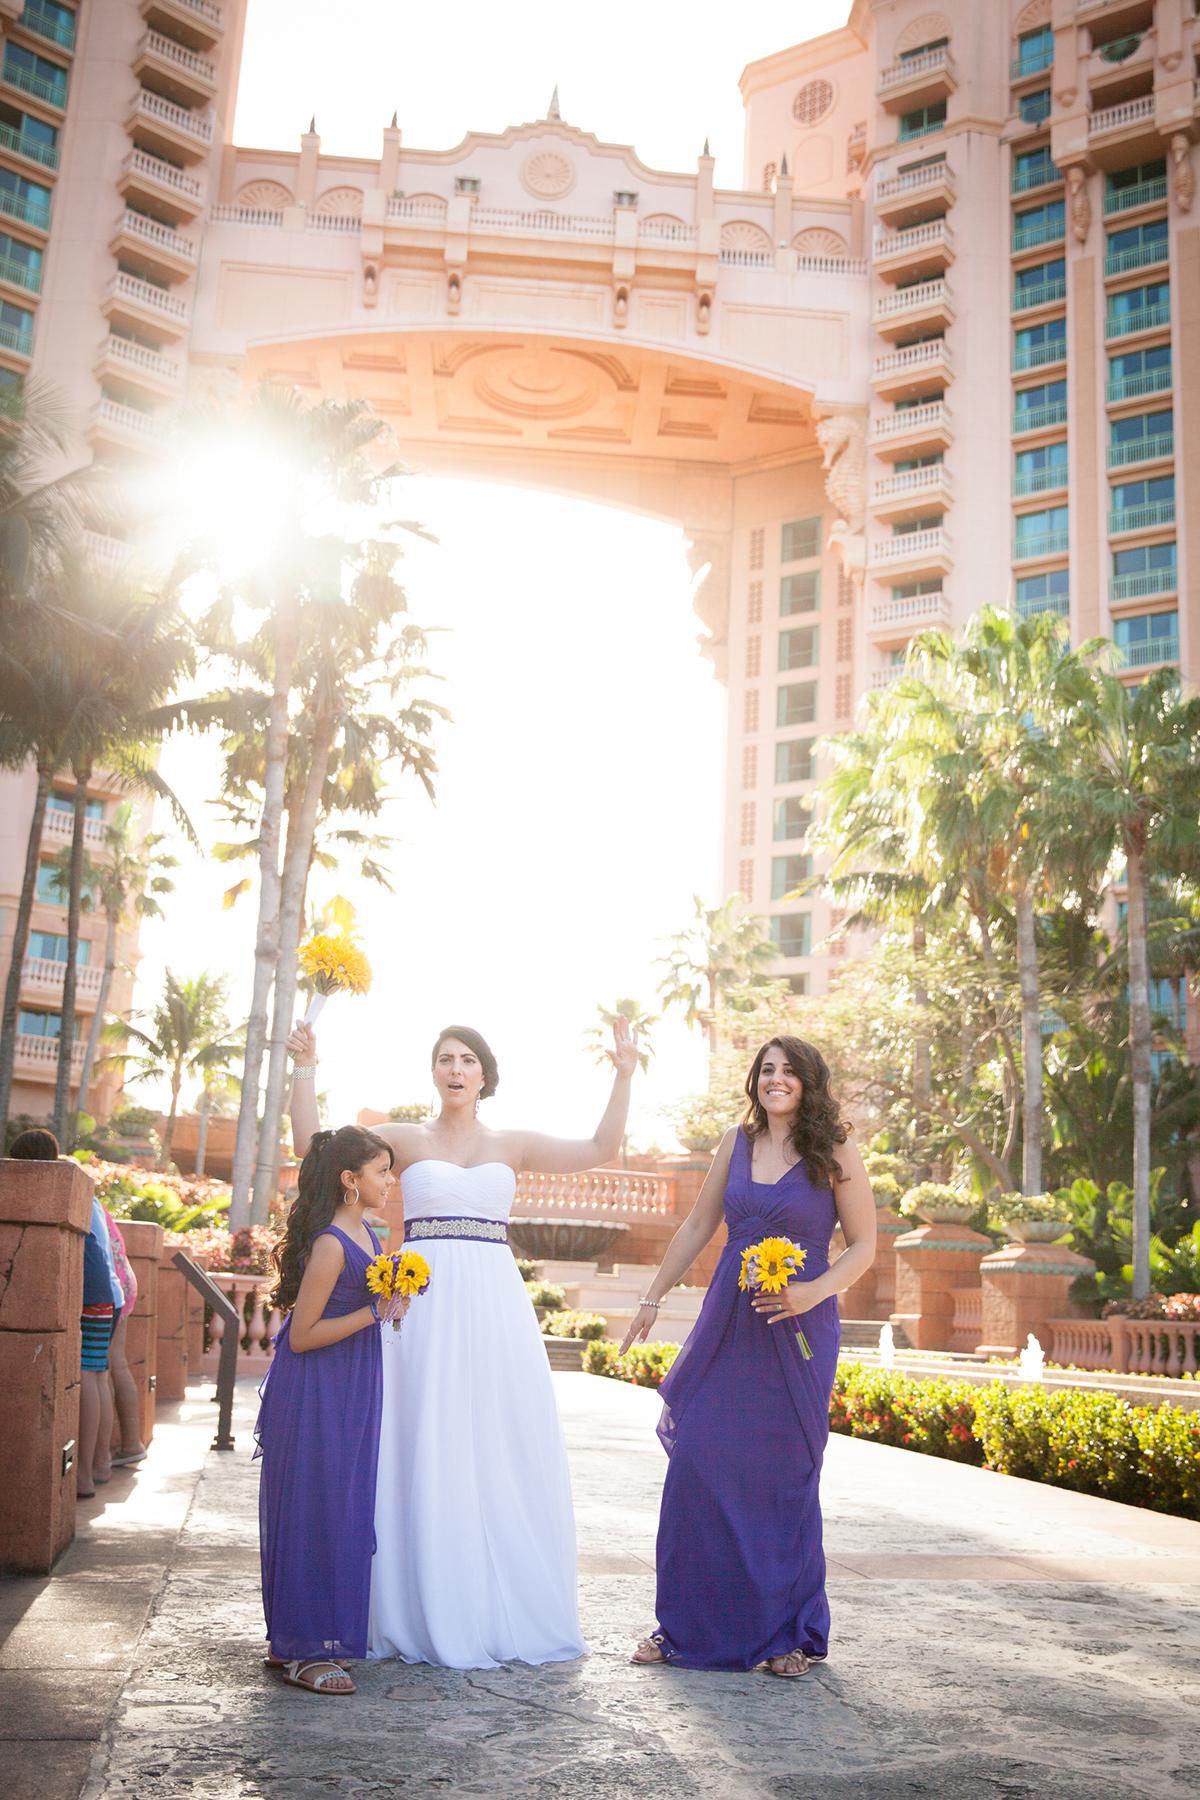 Daniela-Edvard_wedding_Dukat-Photos-1060.jpg